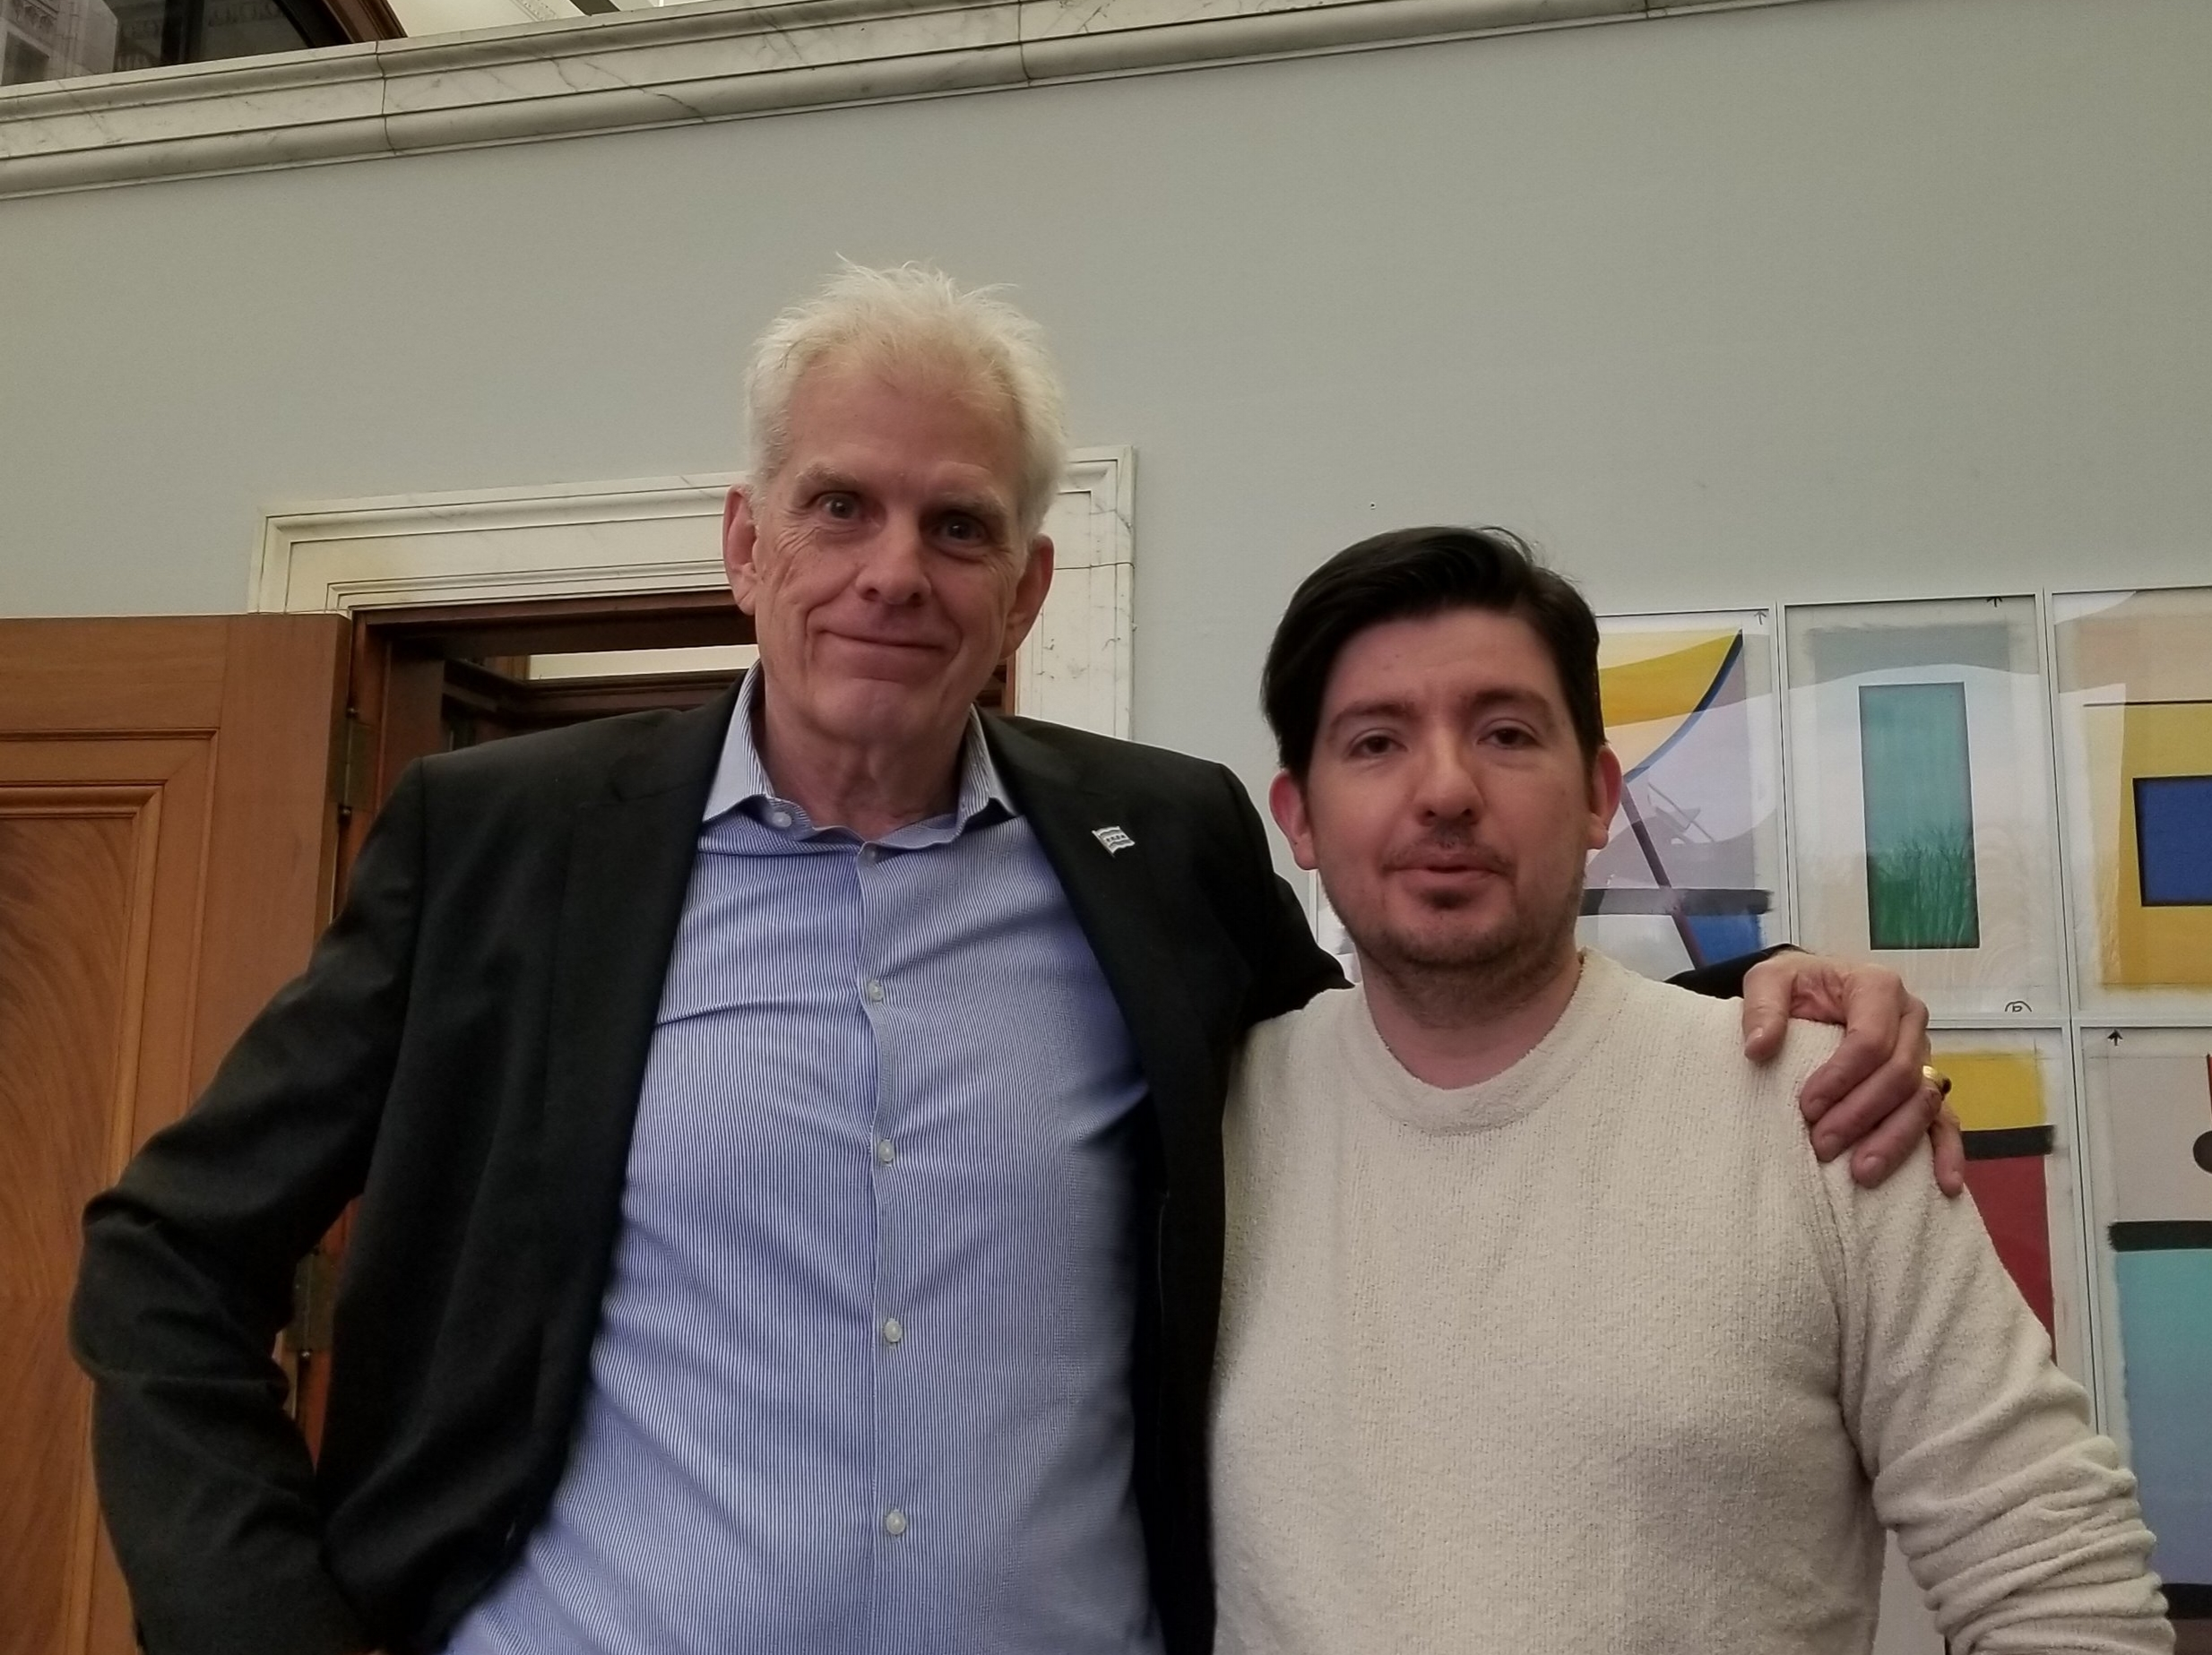 Chicago DCASE Commissioner Mark Kelly and WDCB's Gary Zidek